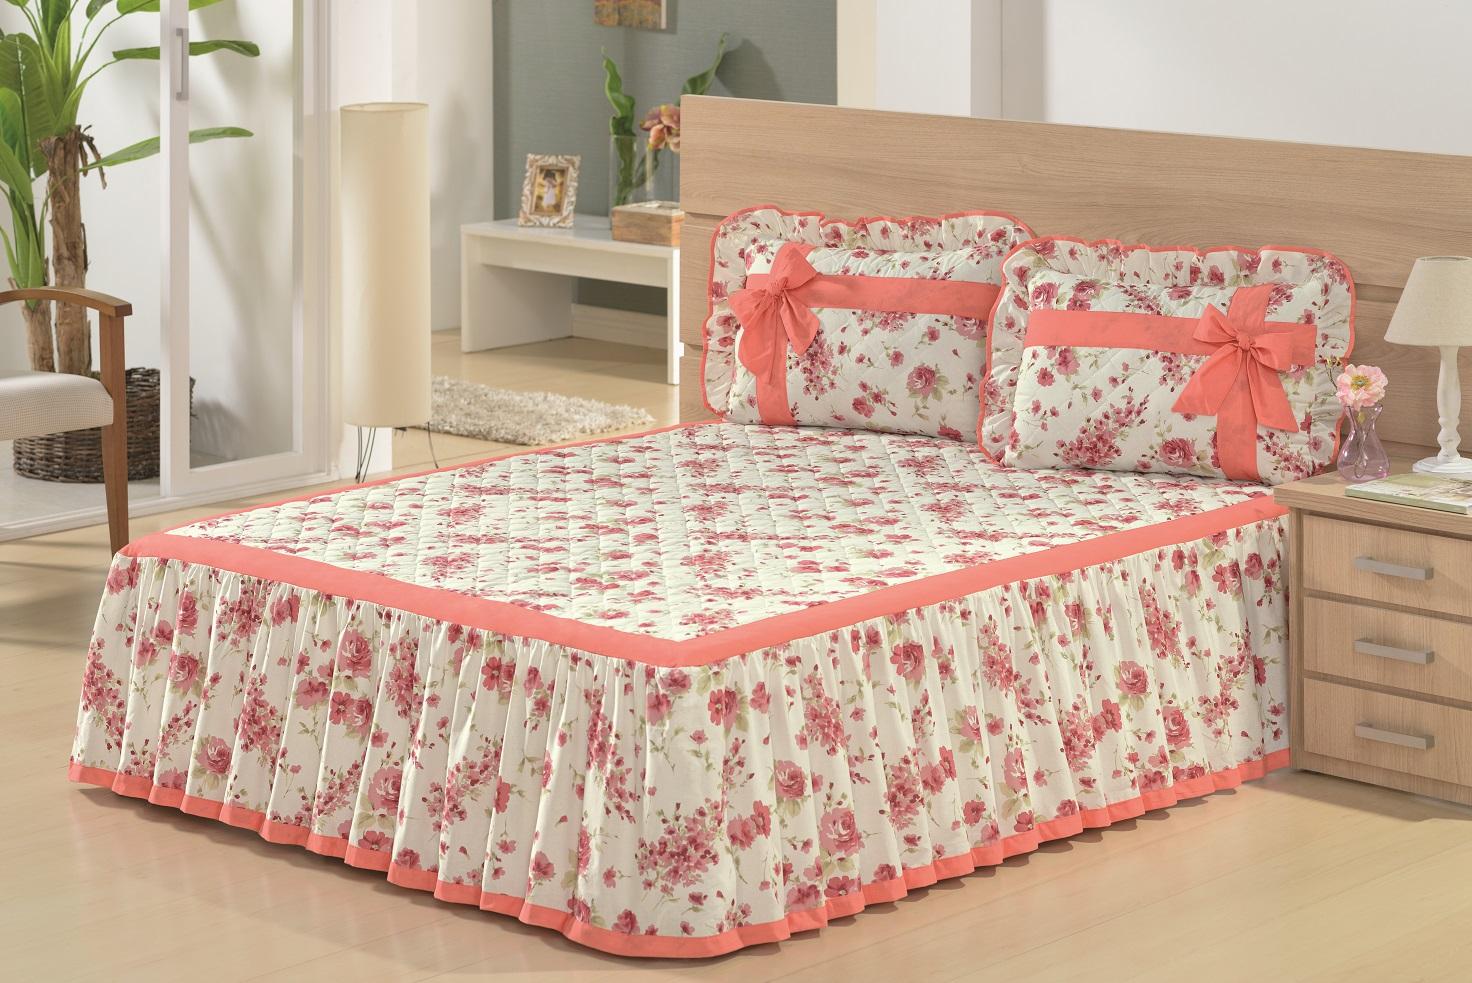 Colchas archives blog mix lar - Imagenes de colchas para camas ...